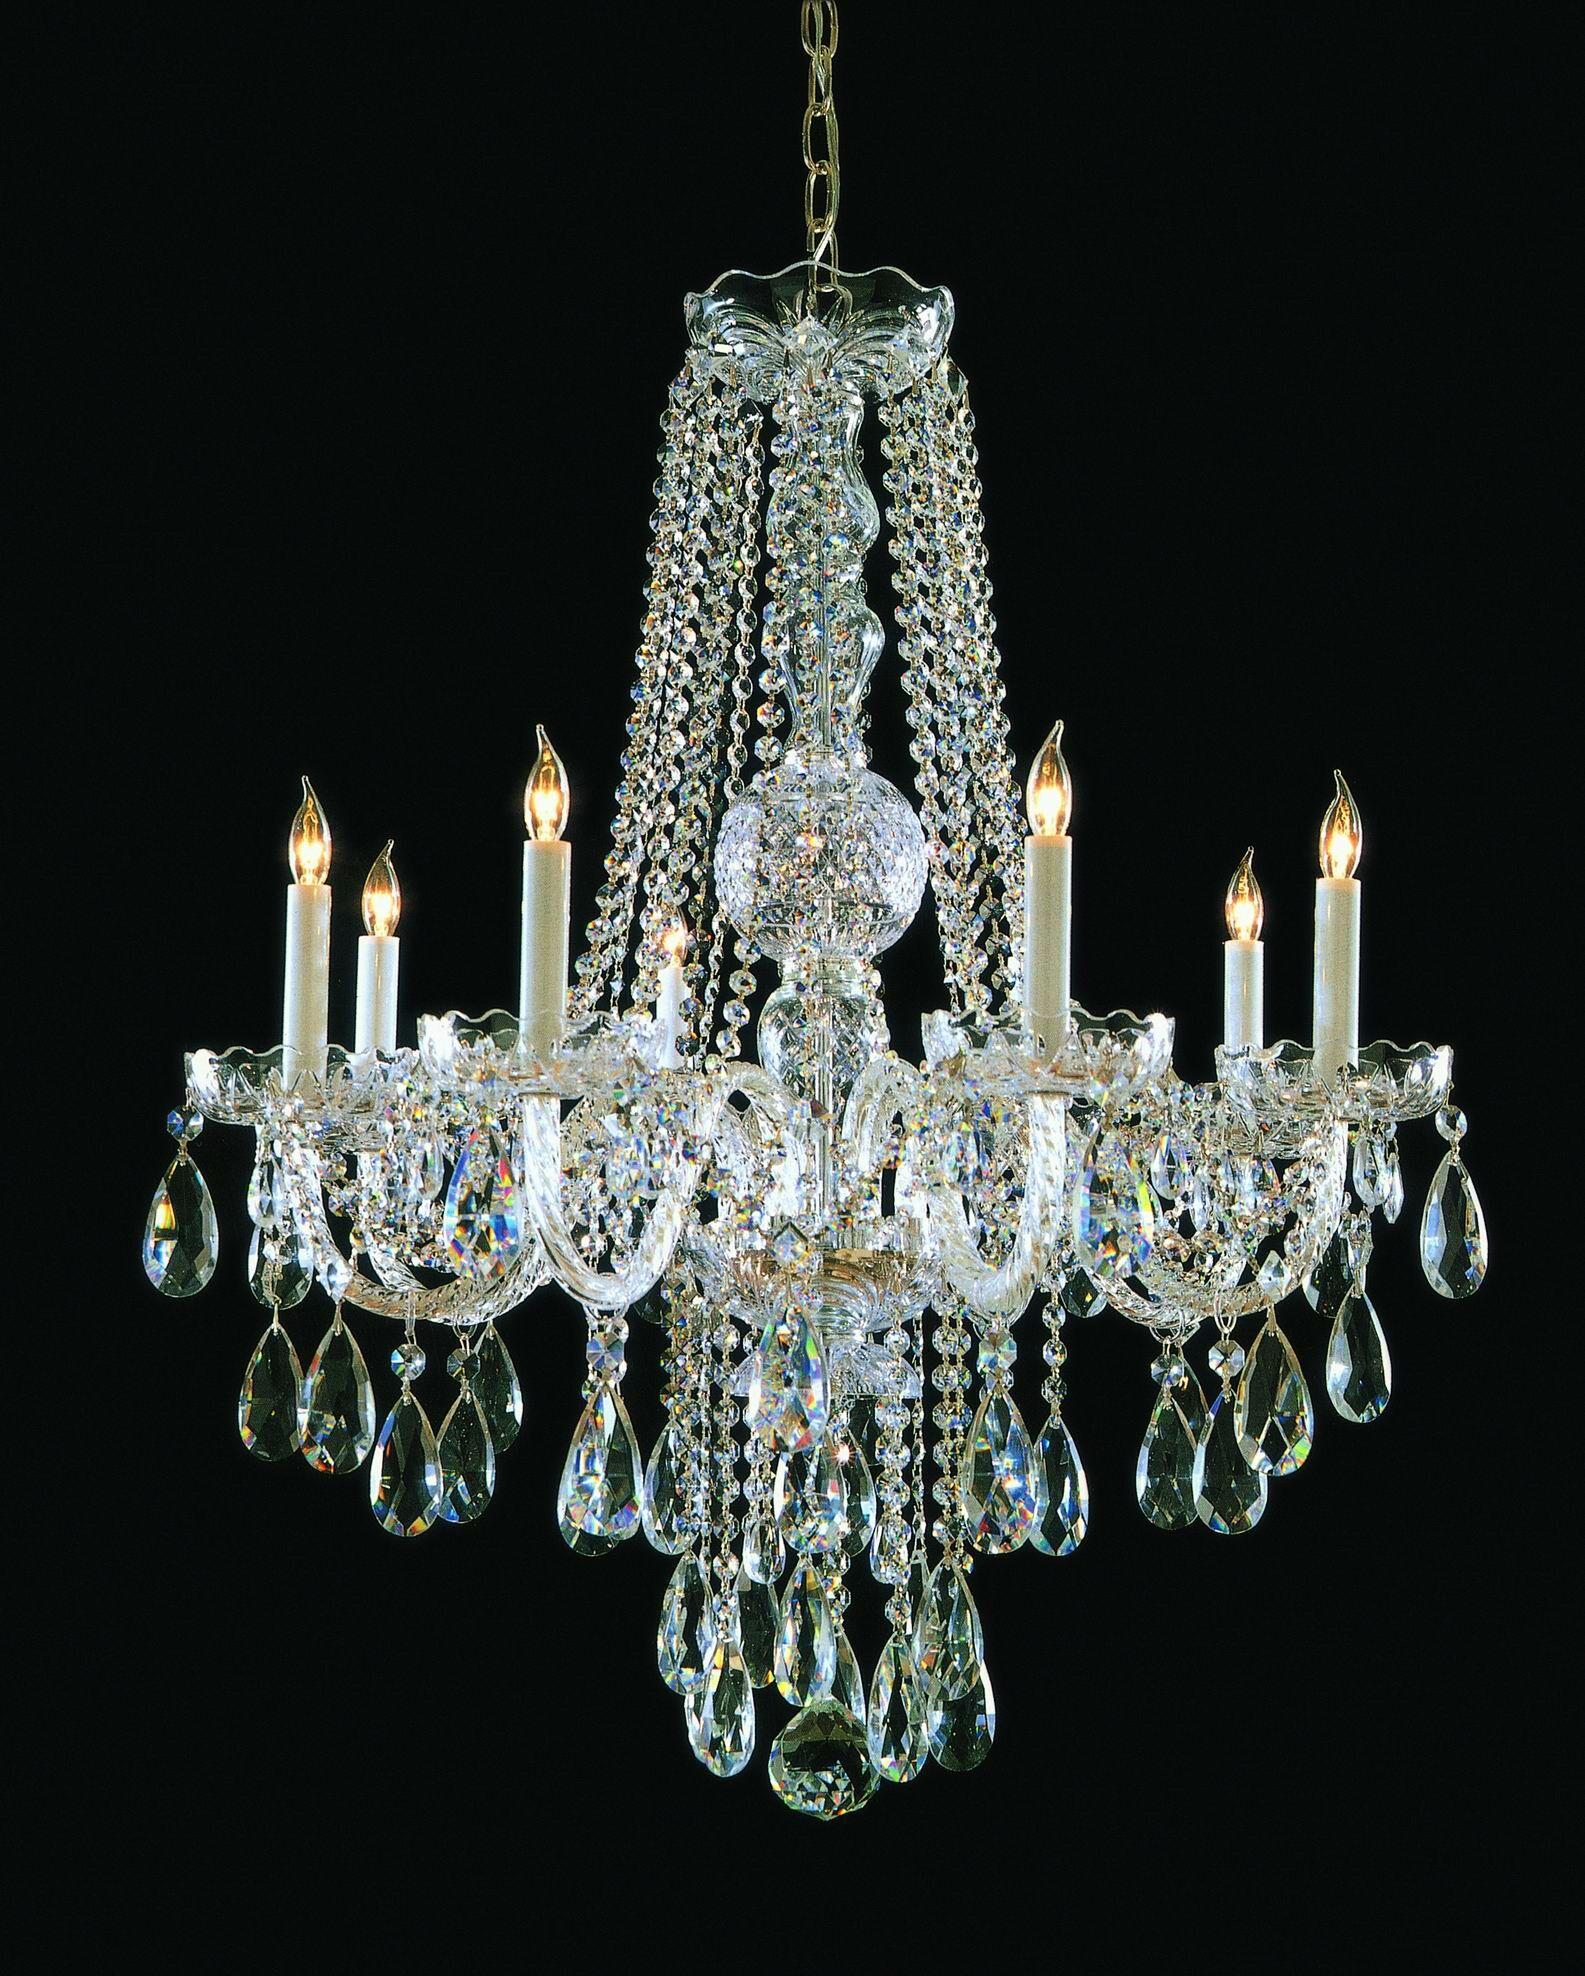 Milan 8-Light Candle Style Chandelier Finish: Polished Brass, Crystal Type: Swarovski Strass